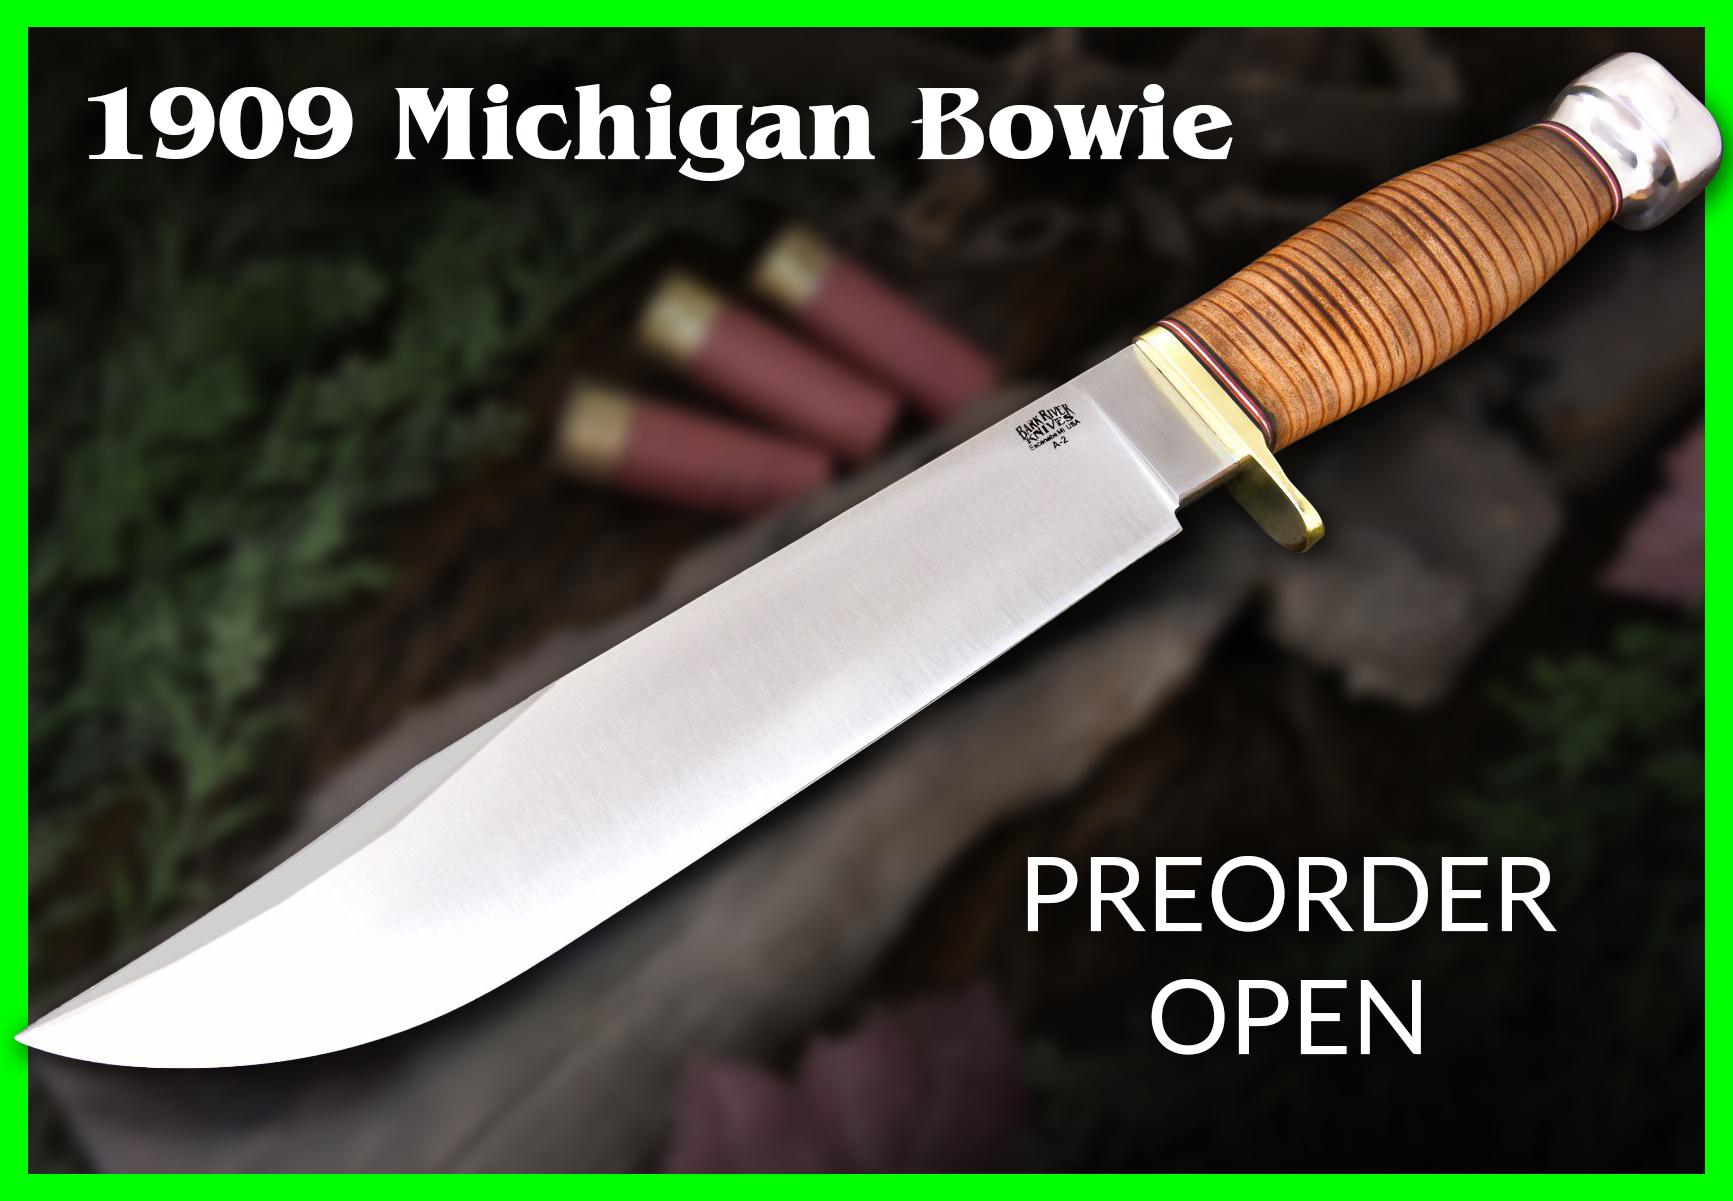 1909-michigan-bowie-open.jpg